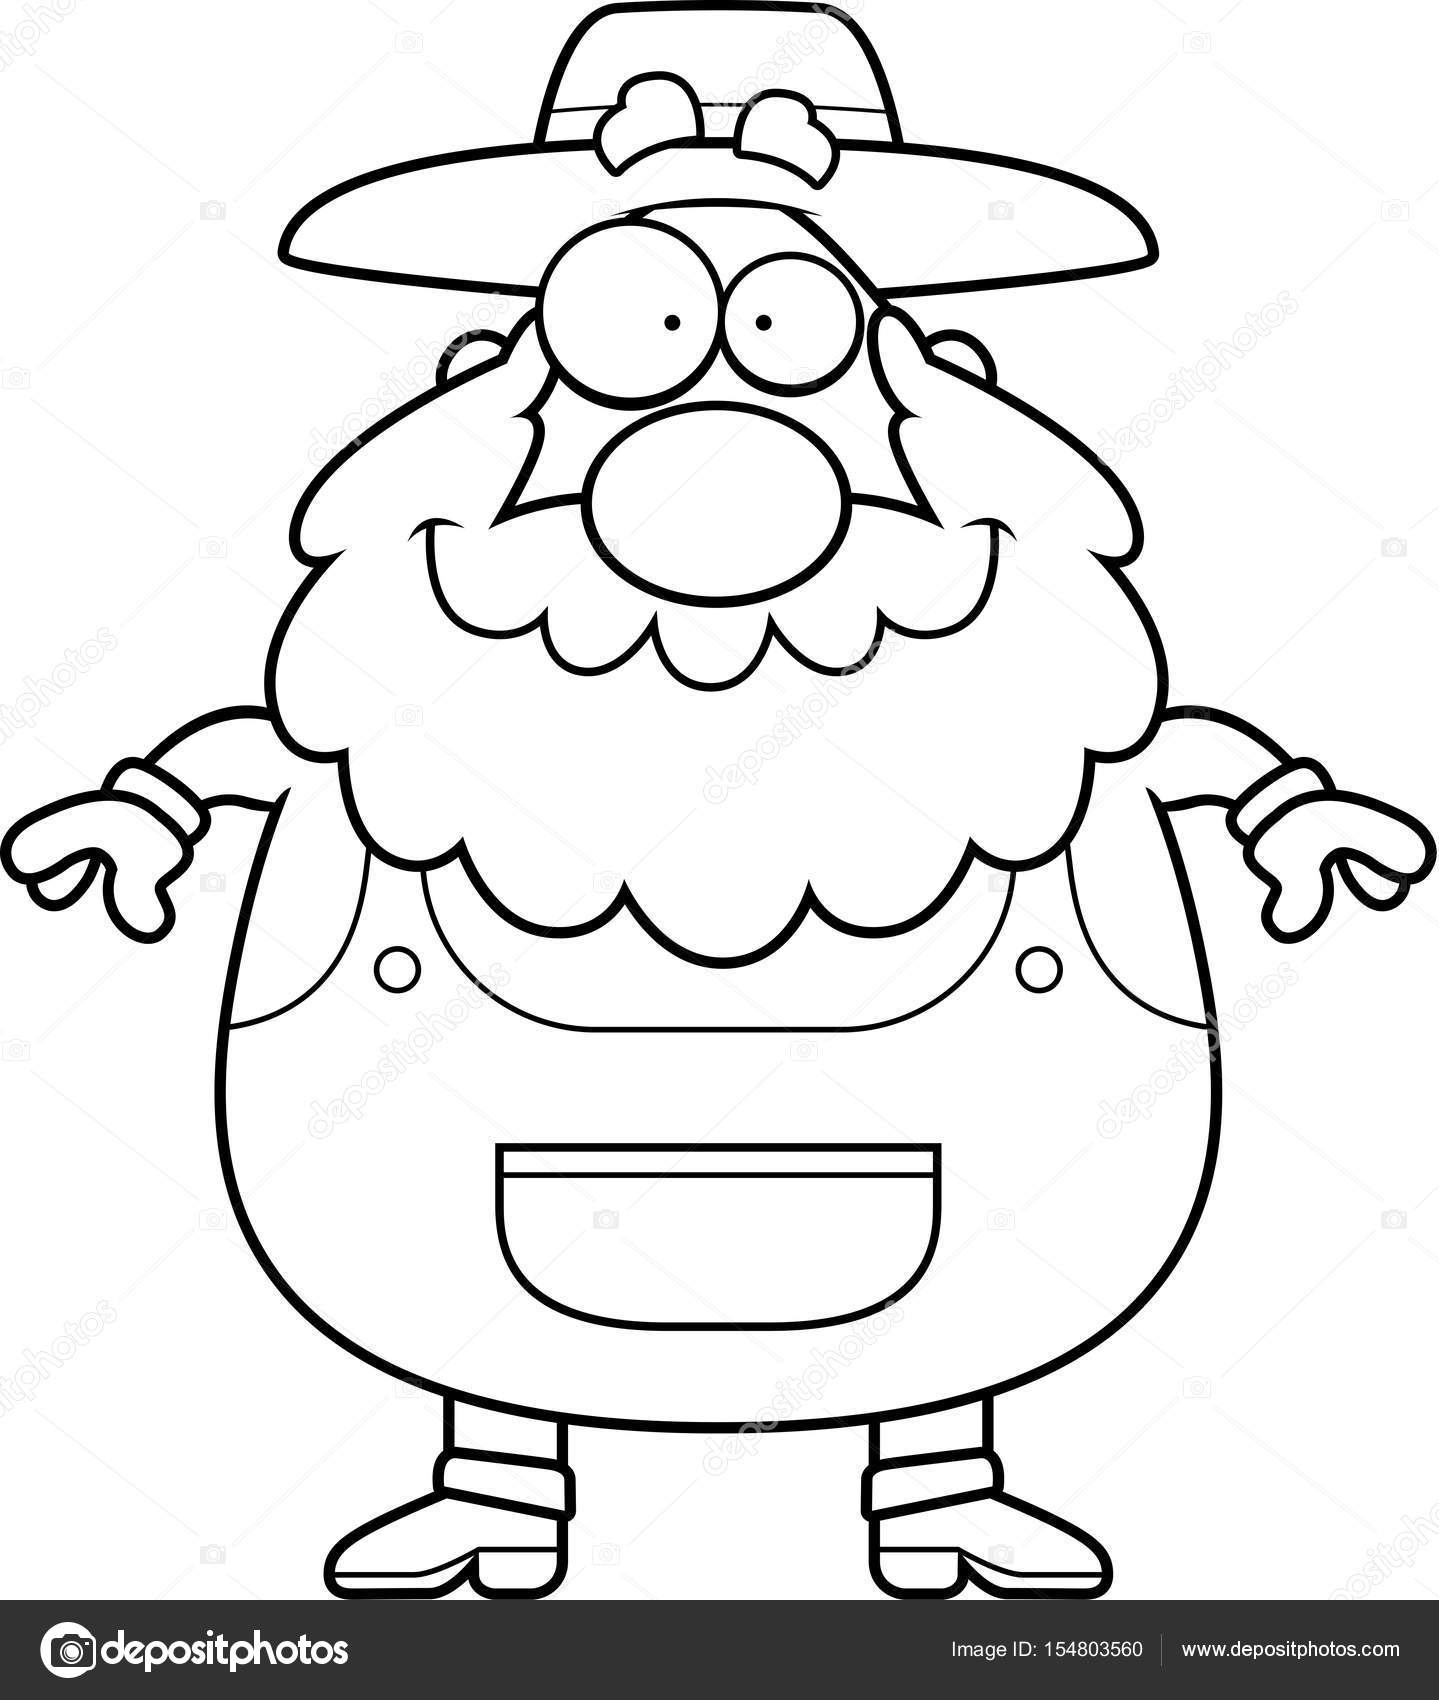 Dibujos Animados Granjero Sonriendo Vector De Stock Cthoman